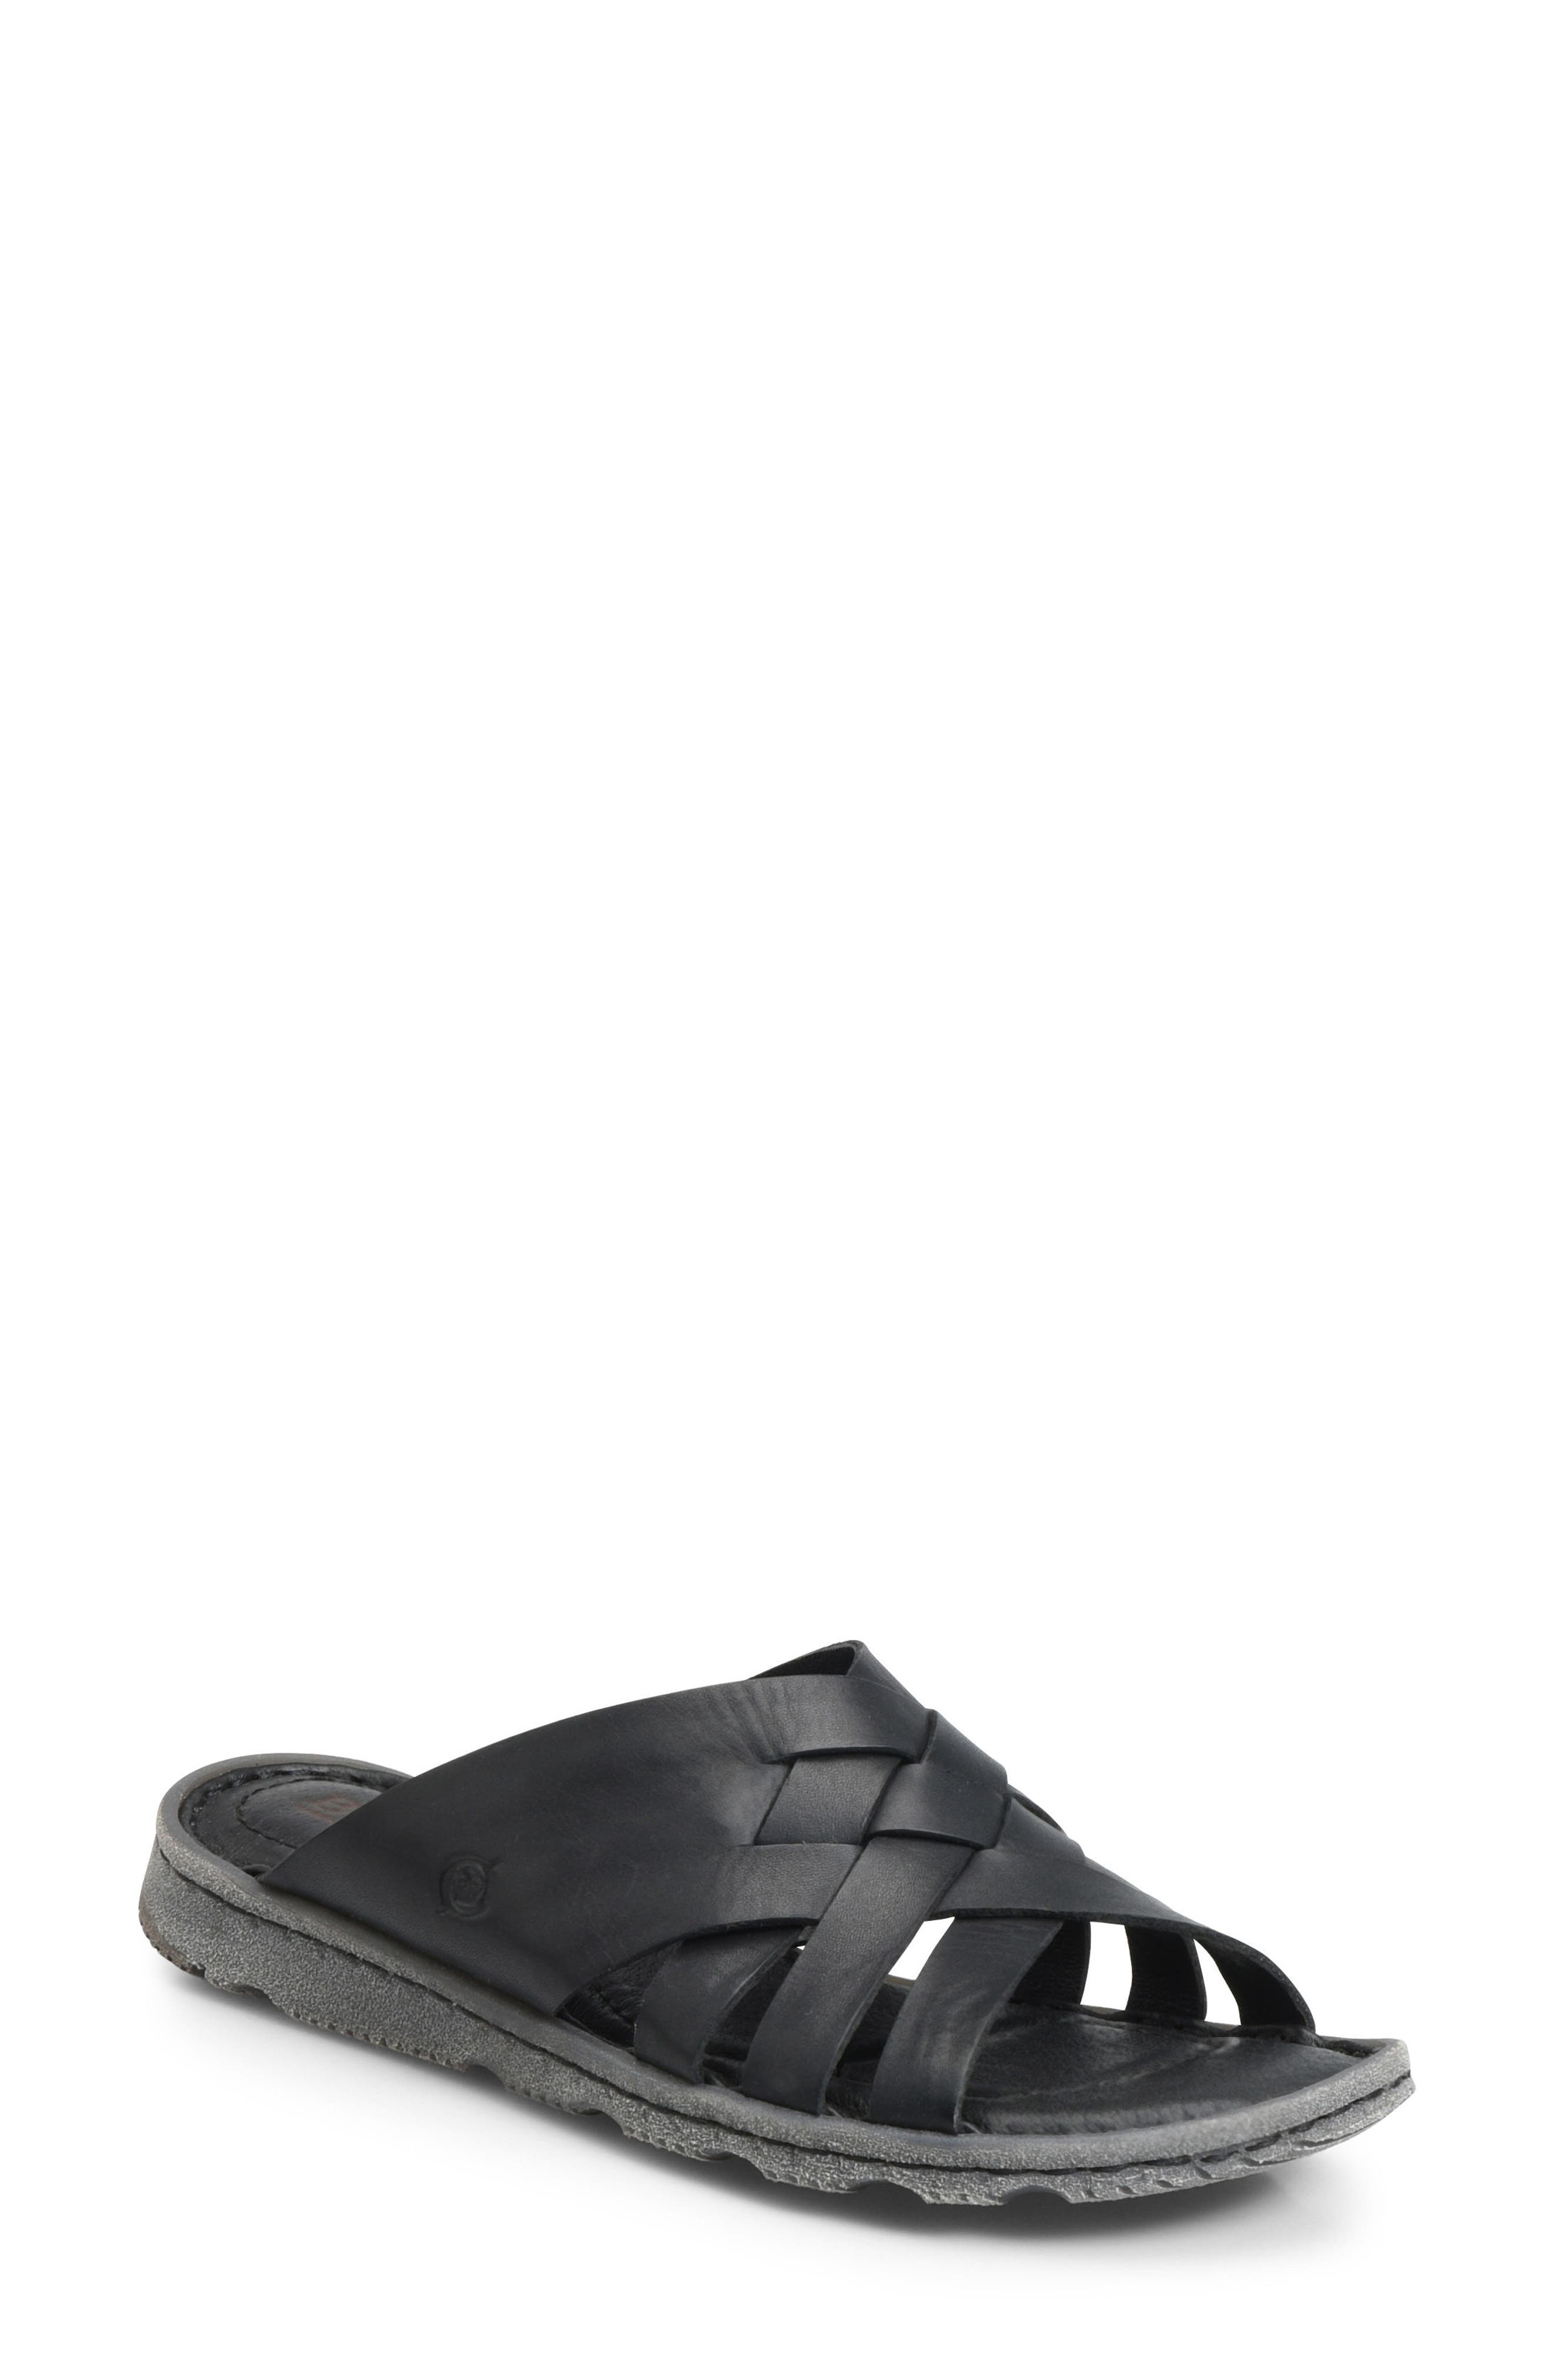 Tarpon Slide Sandal,                         Main,                         color, 001